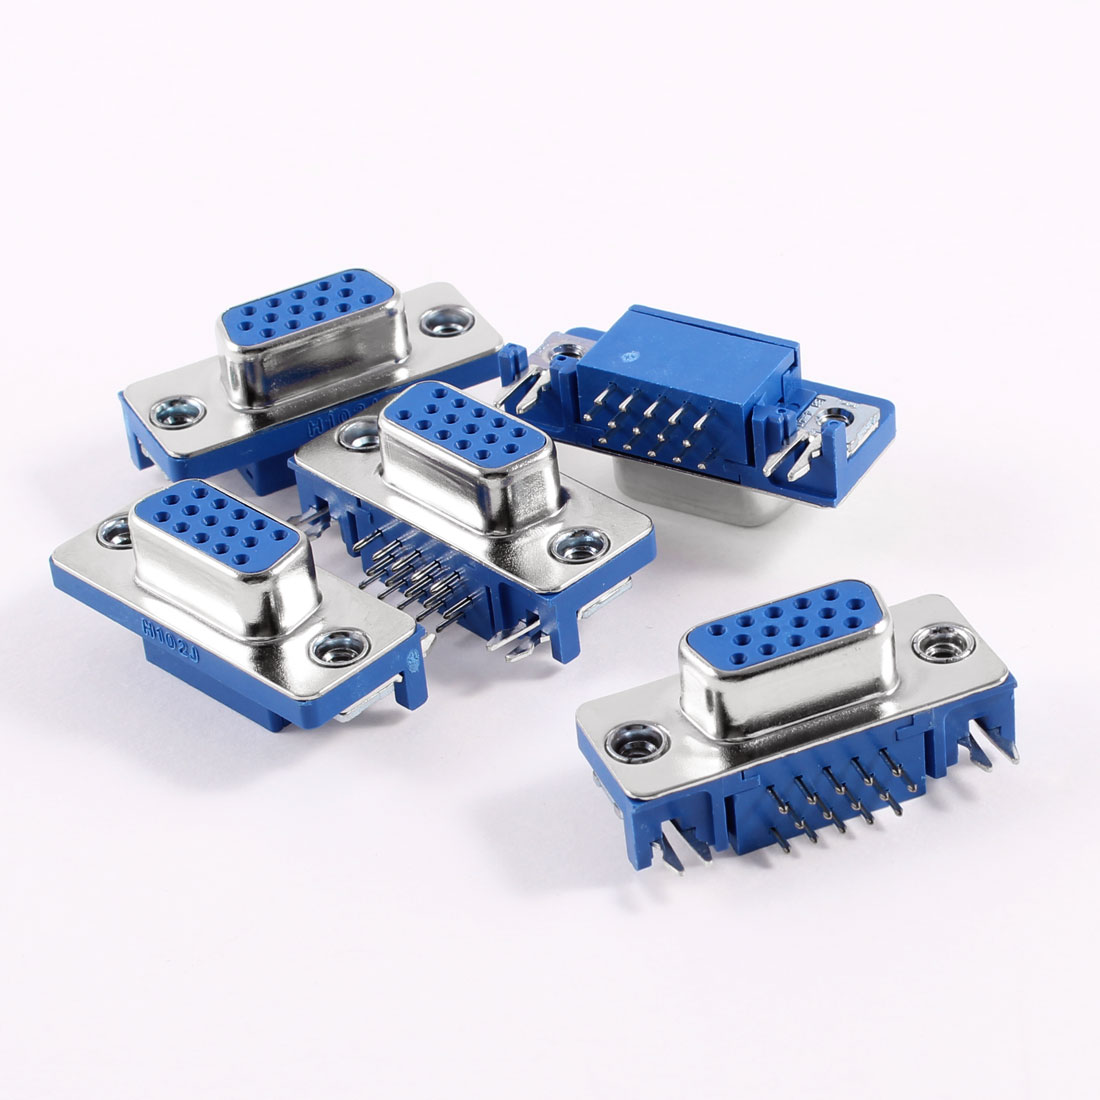 5 Pcs VGA 15 Pin Female Right Angle PC Connectors Adapter